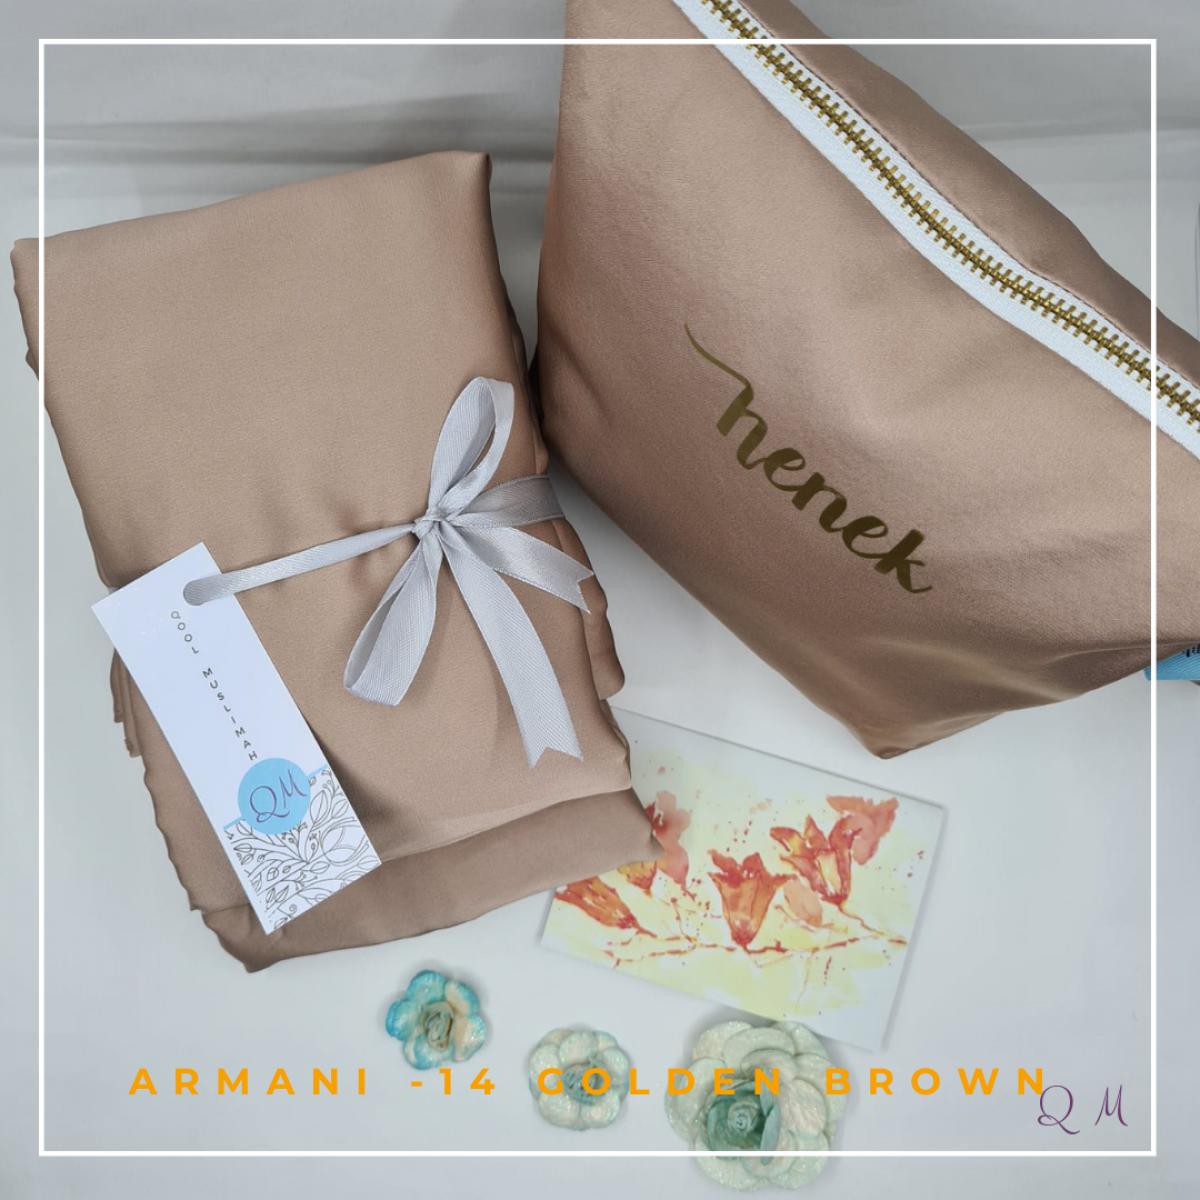 14. Telekung / Mukena Armani Silk - Golden Brownish - Qool Muslimah